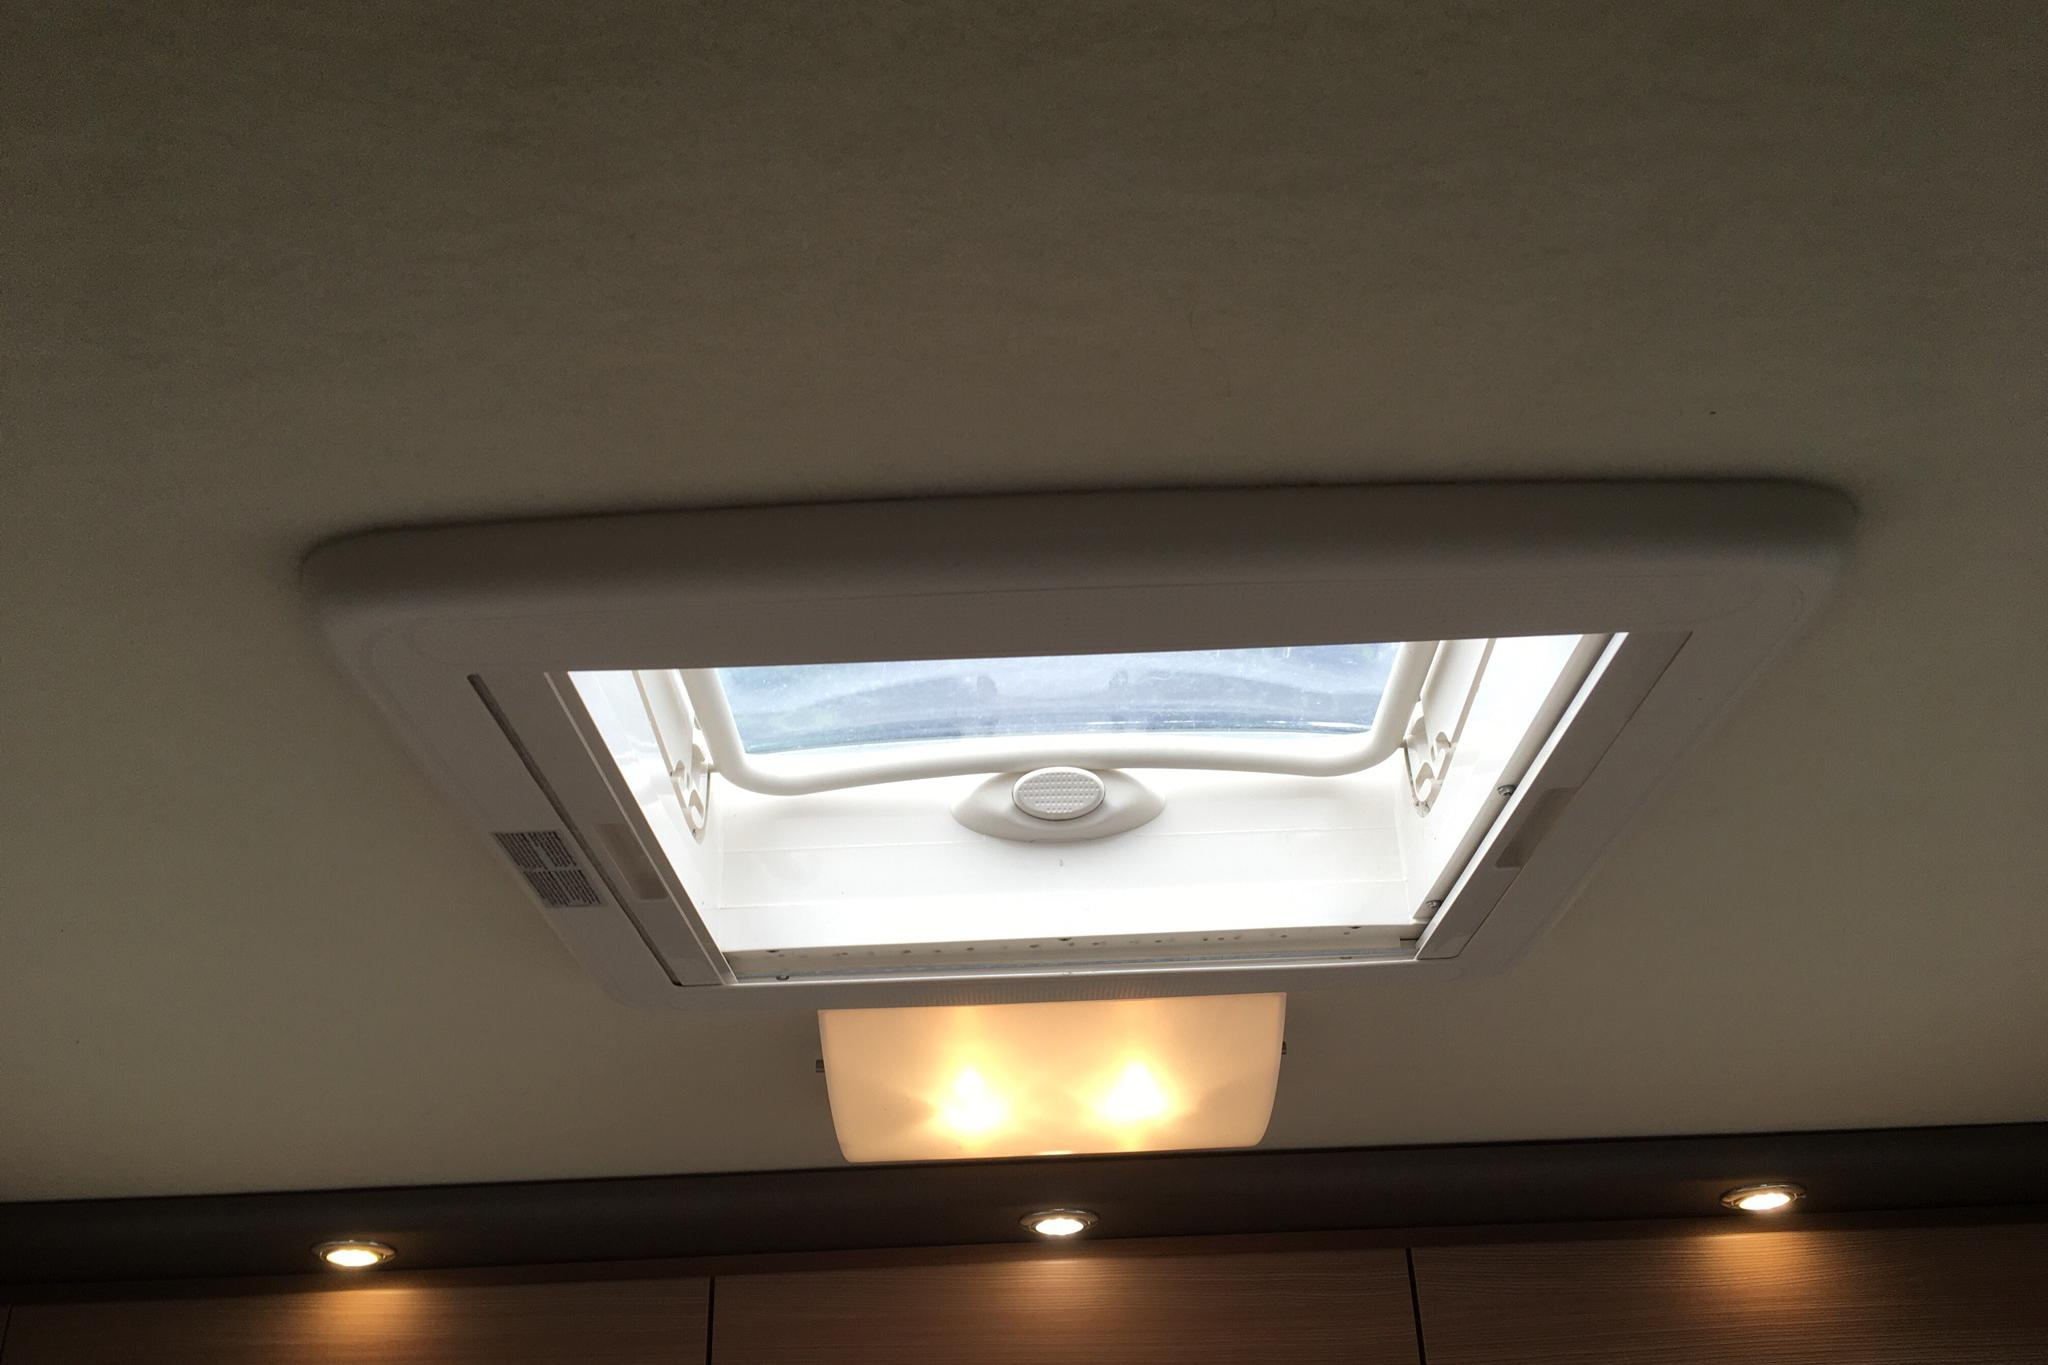 FIAT KNAUS Sky i 700  Husbil - 50 520 km - Manual - 2012